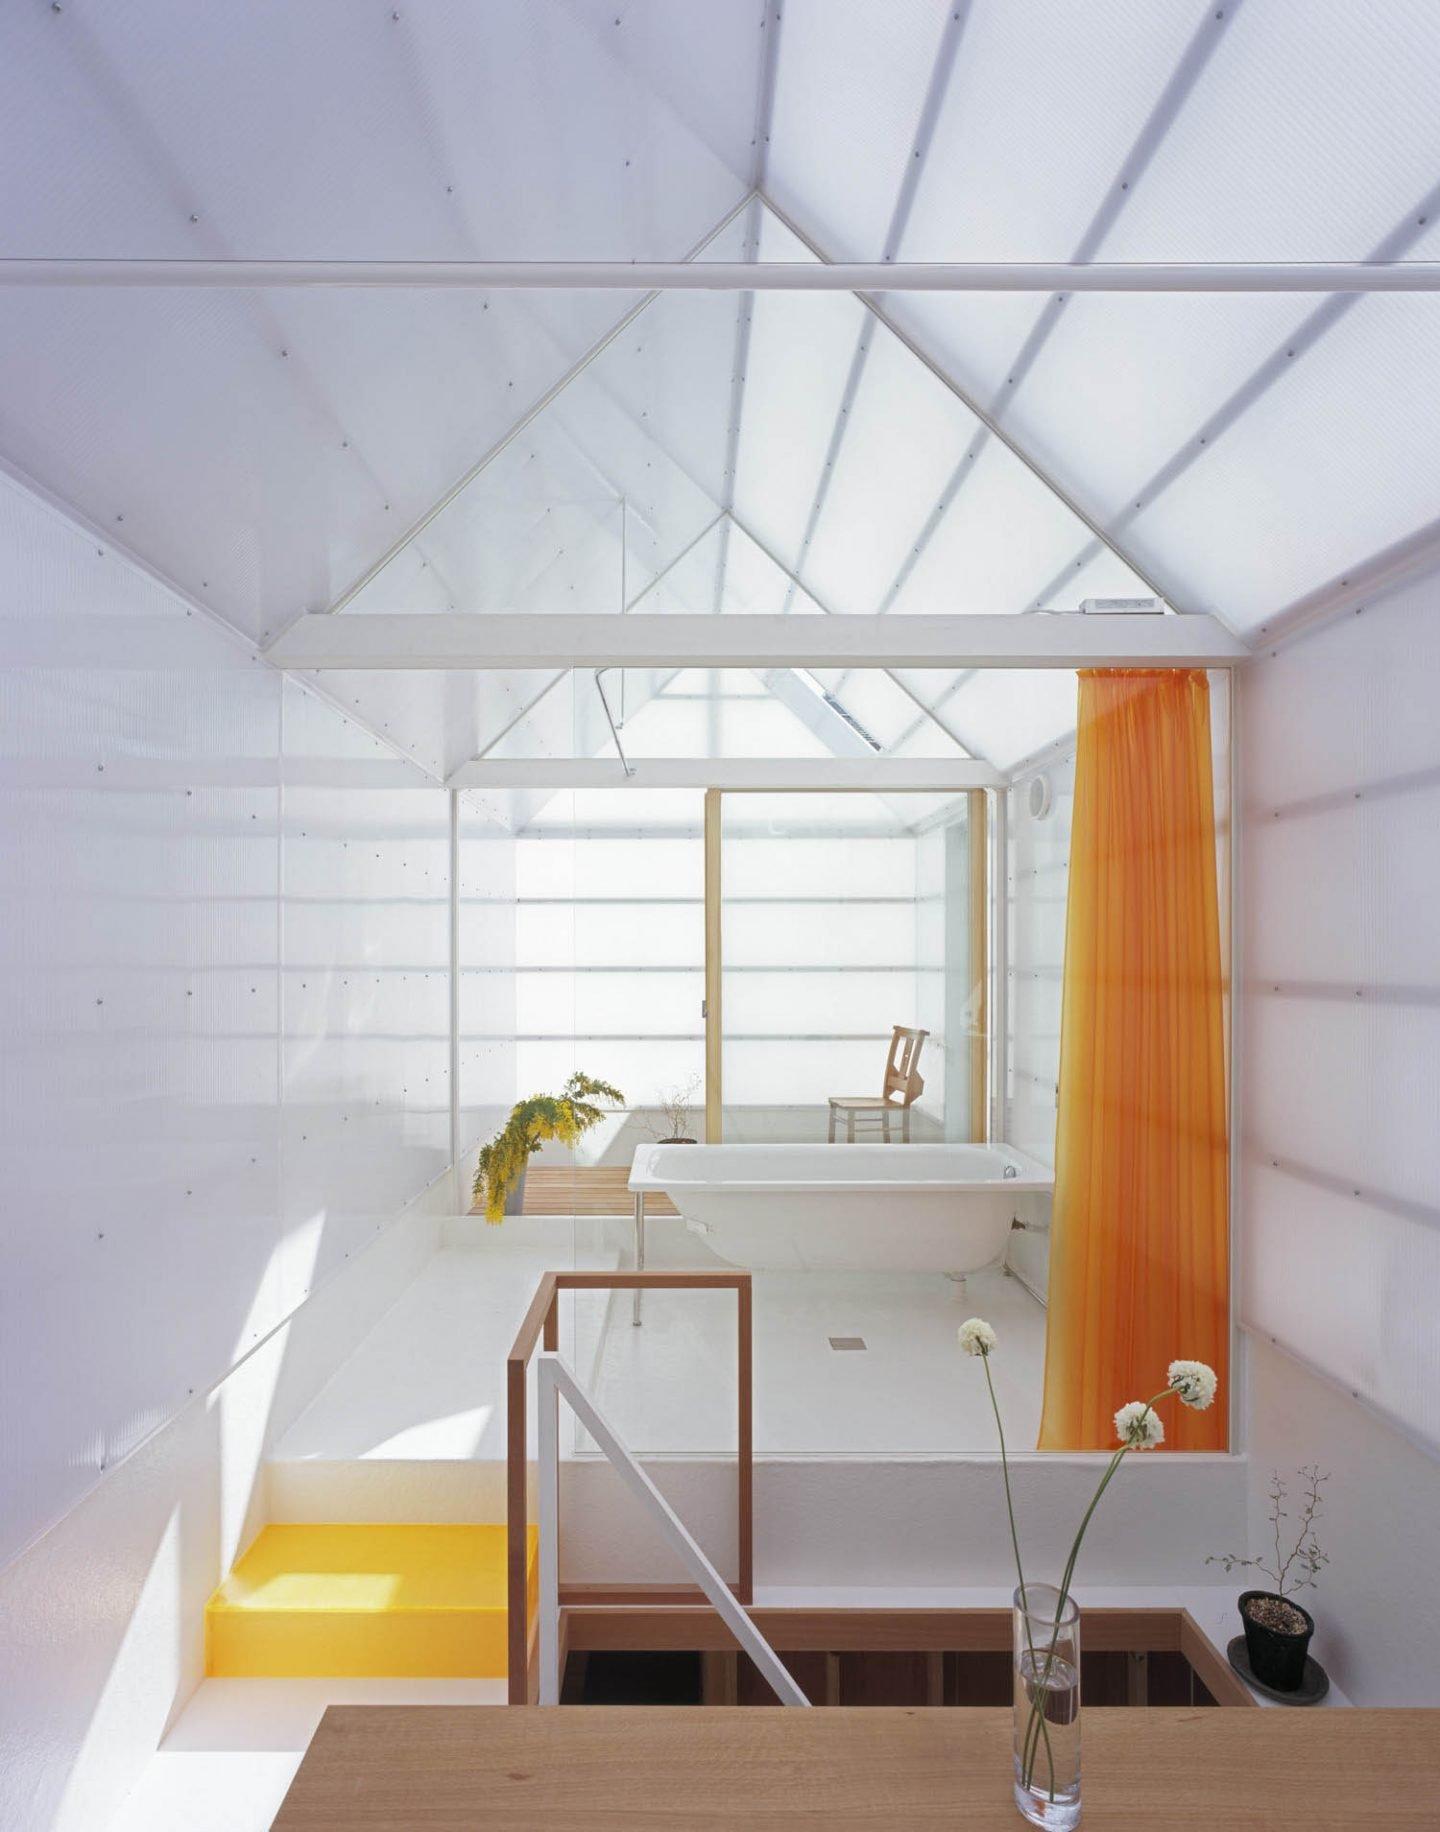 iGNANT_Architecture_Tato_Architects_Yo_Shimada_House_In_Yamasaki_30